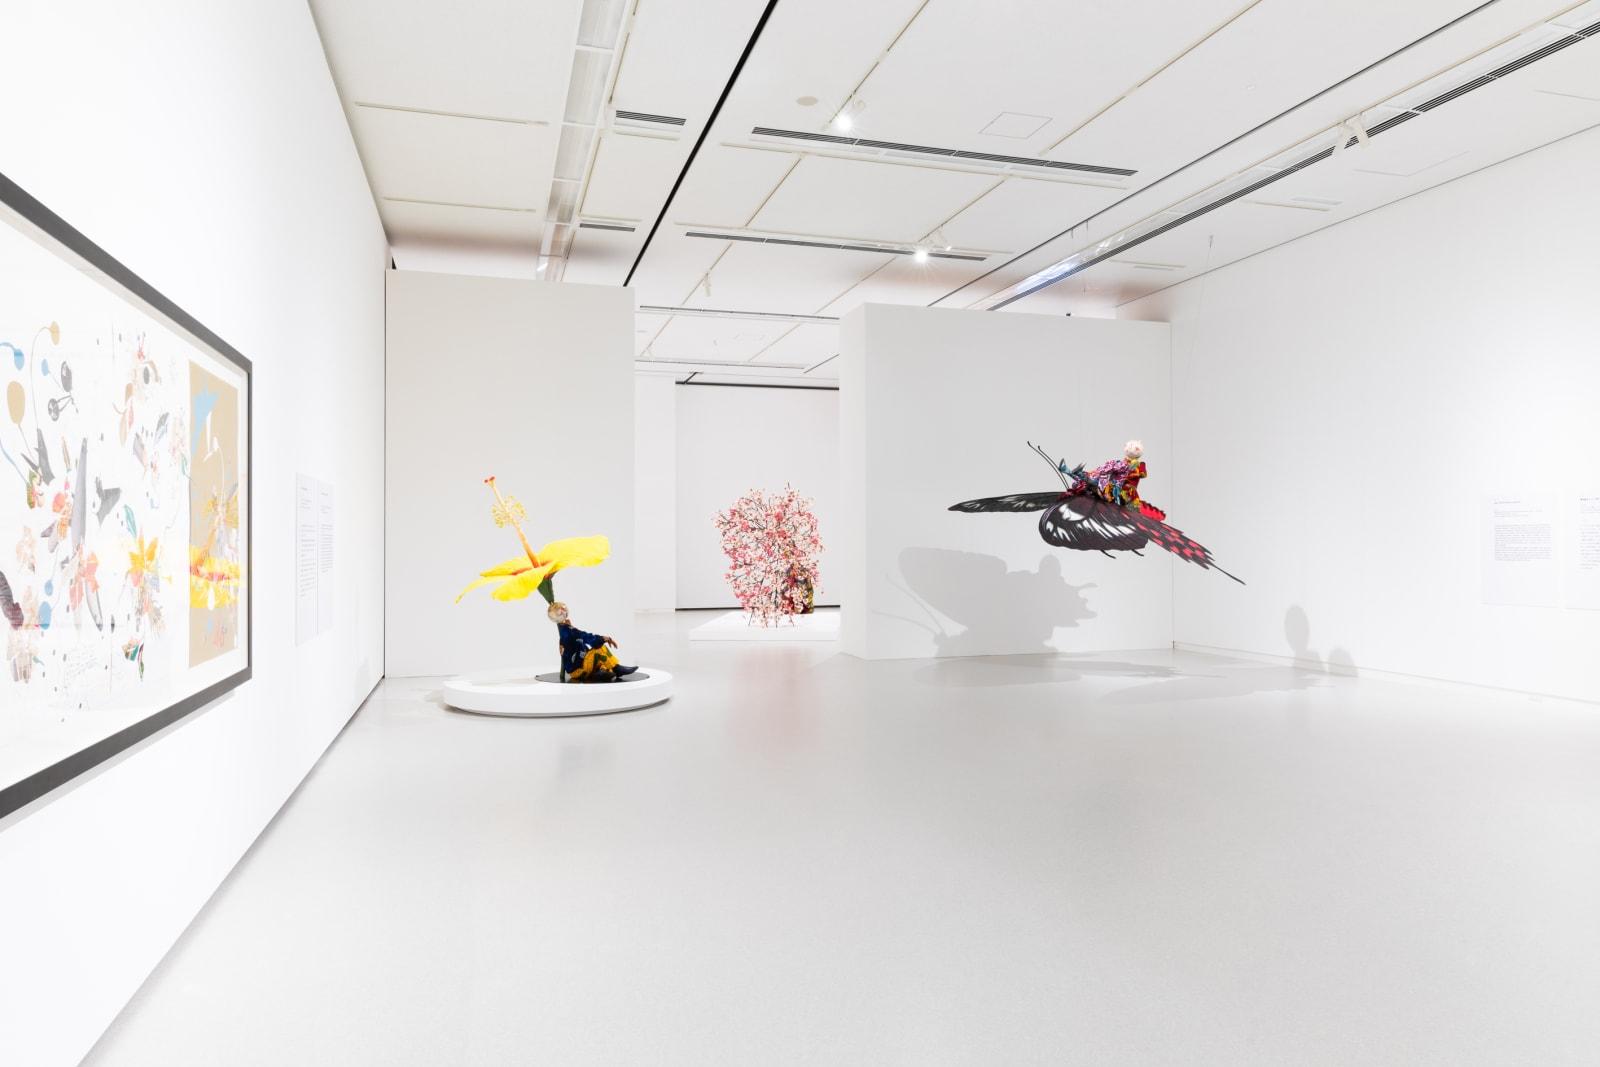 <p>Installation view: 'Yinka Shonibare MBE: Flower Power'<span>, Fukuoka Art Museum, Fukuoka (2019)</span></p>